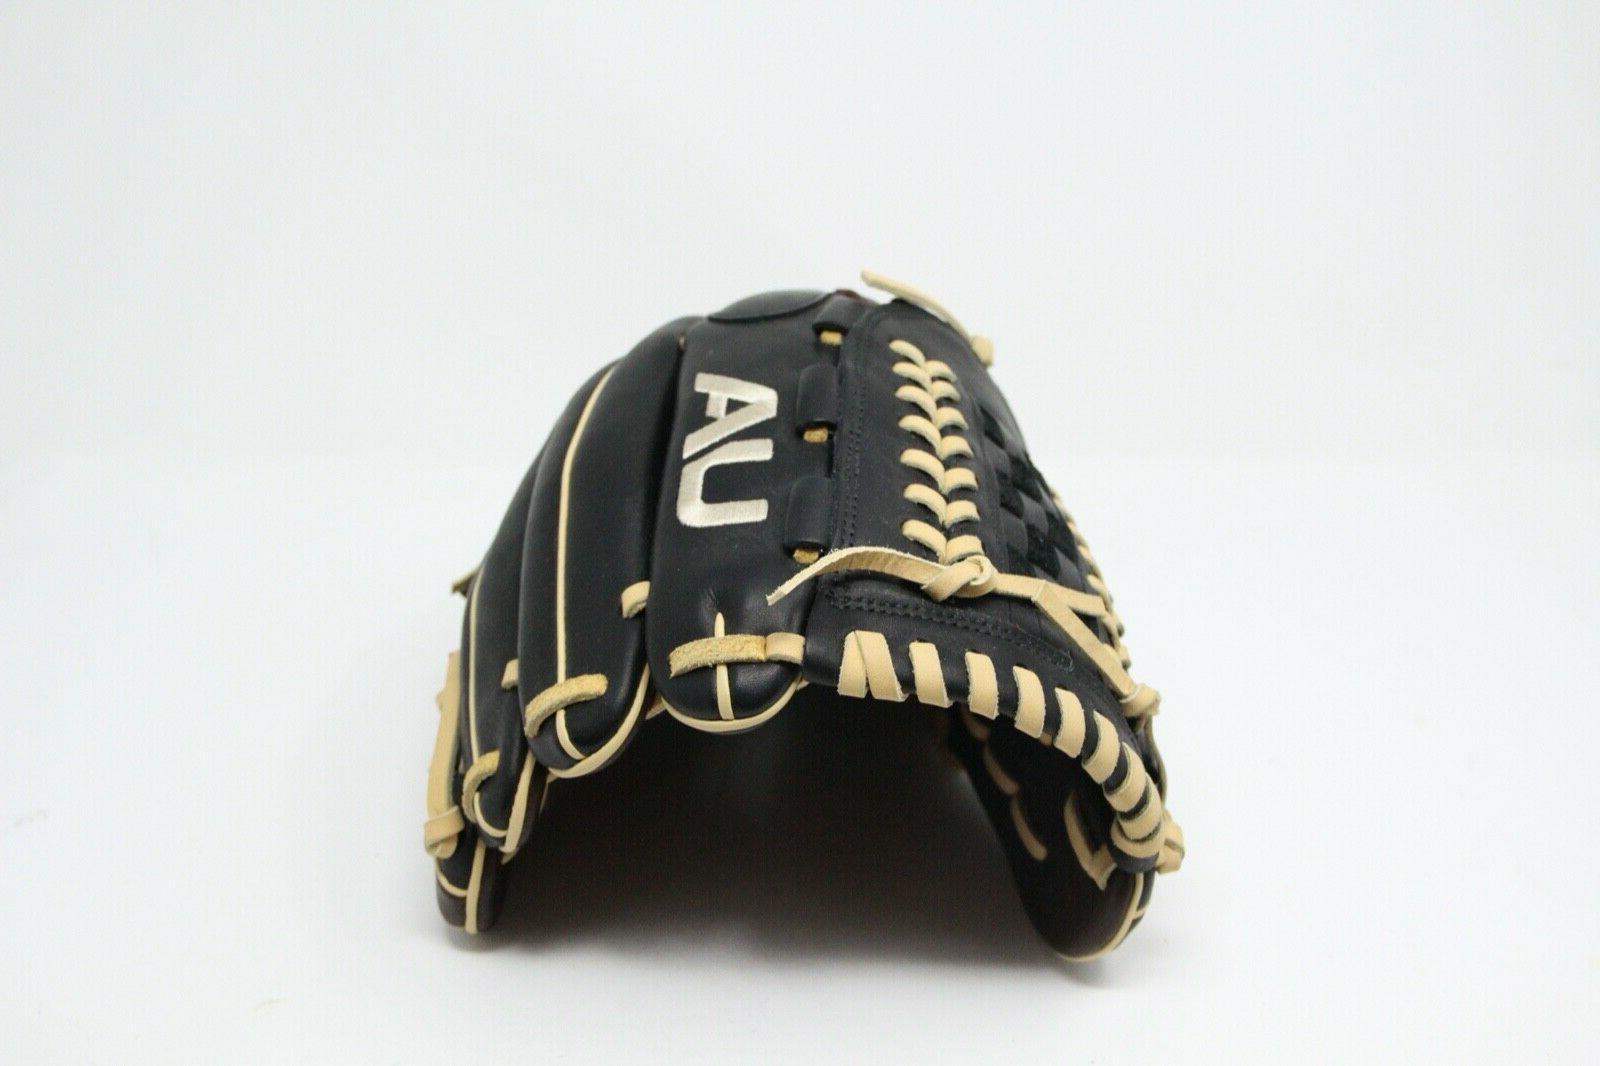 Under Pro Baseball Glove